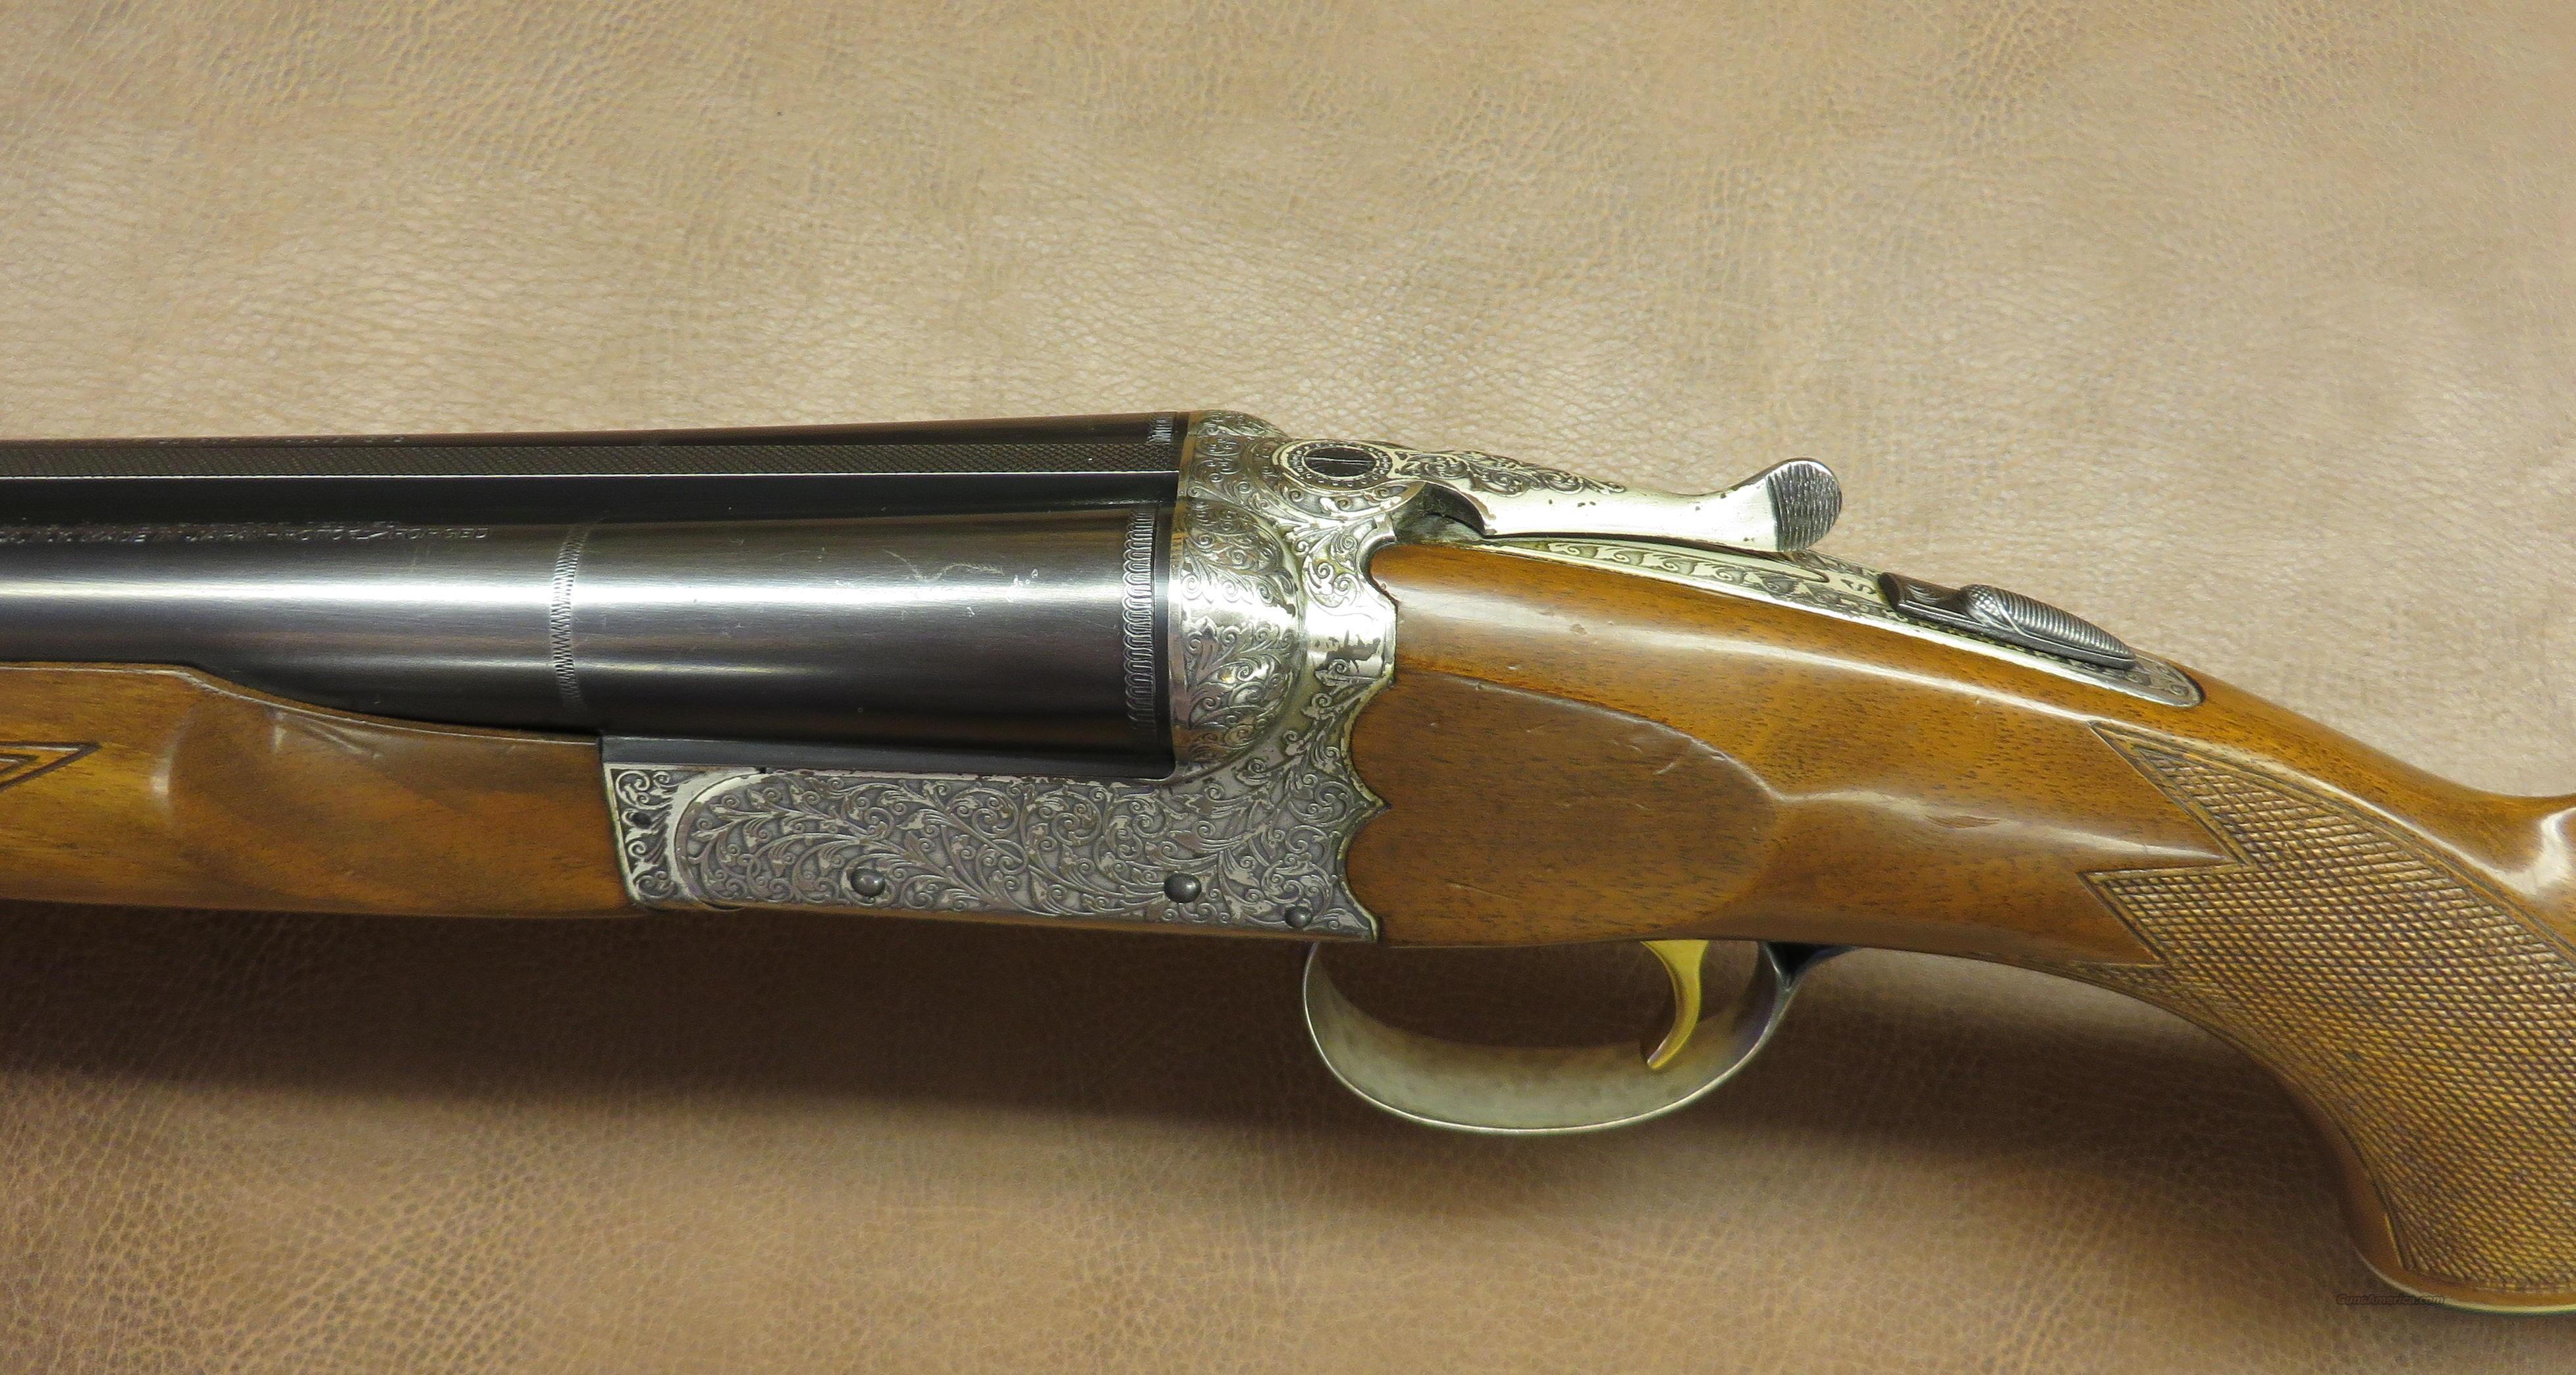 Ithaca Skb Model 200e 12 Ga Db Shotgun Used - Modern Home Revolution